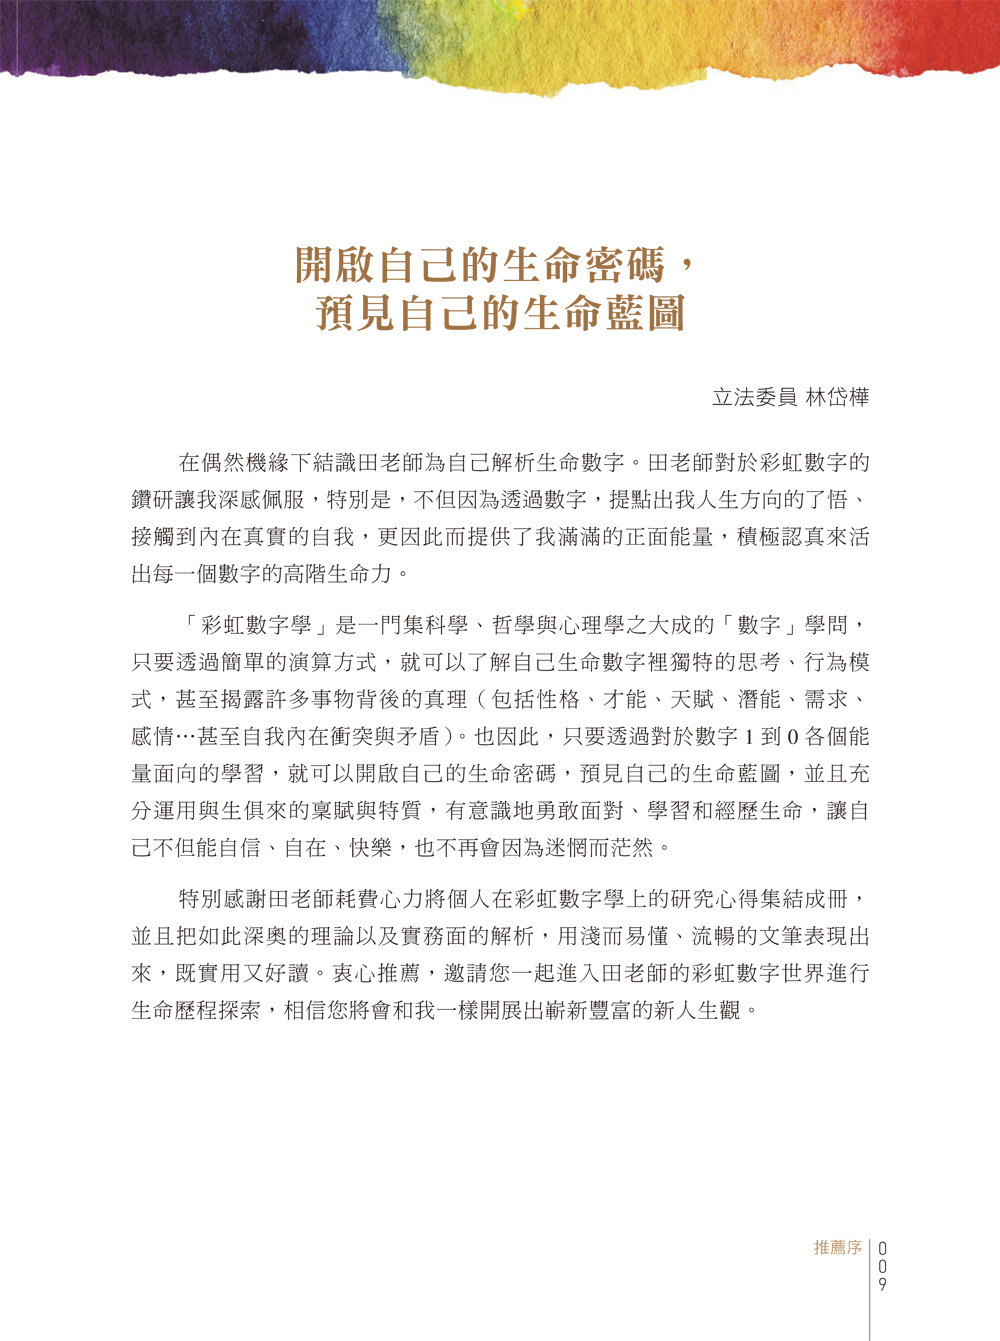 麗子の彩虹數字學:數字解碼與理論基礎-preview-9